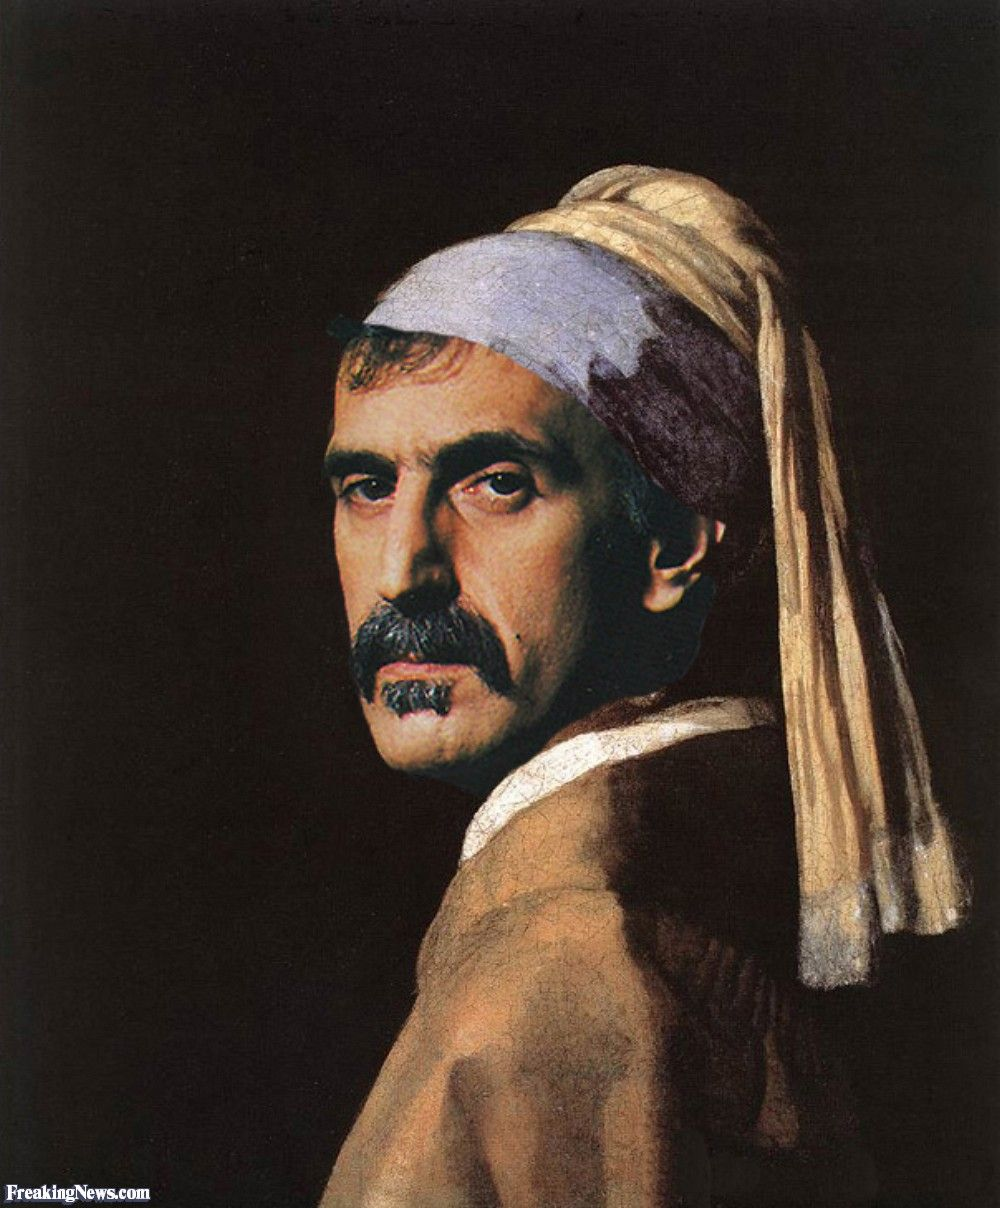 Frank Zappa Happy Birthday with frank zappa pearl zappa | frank zappa forever | pinterest | frank